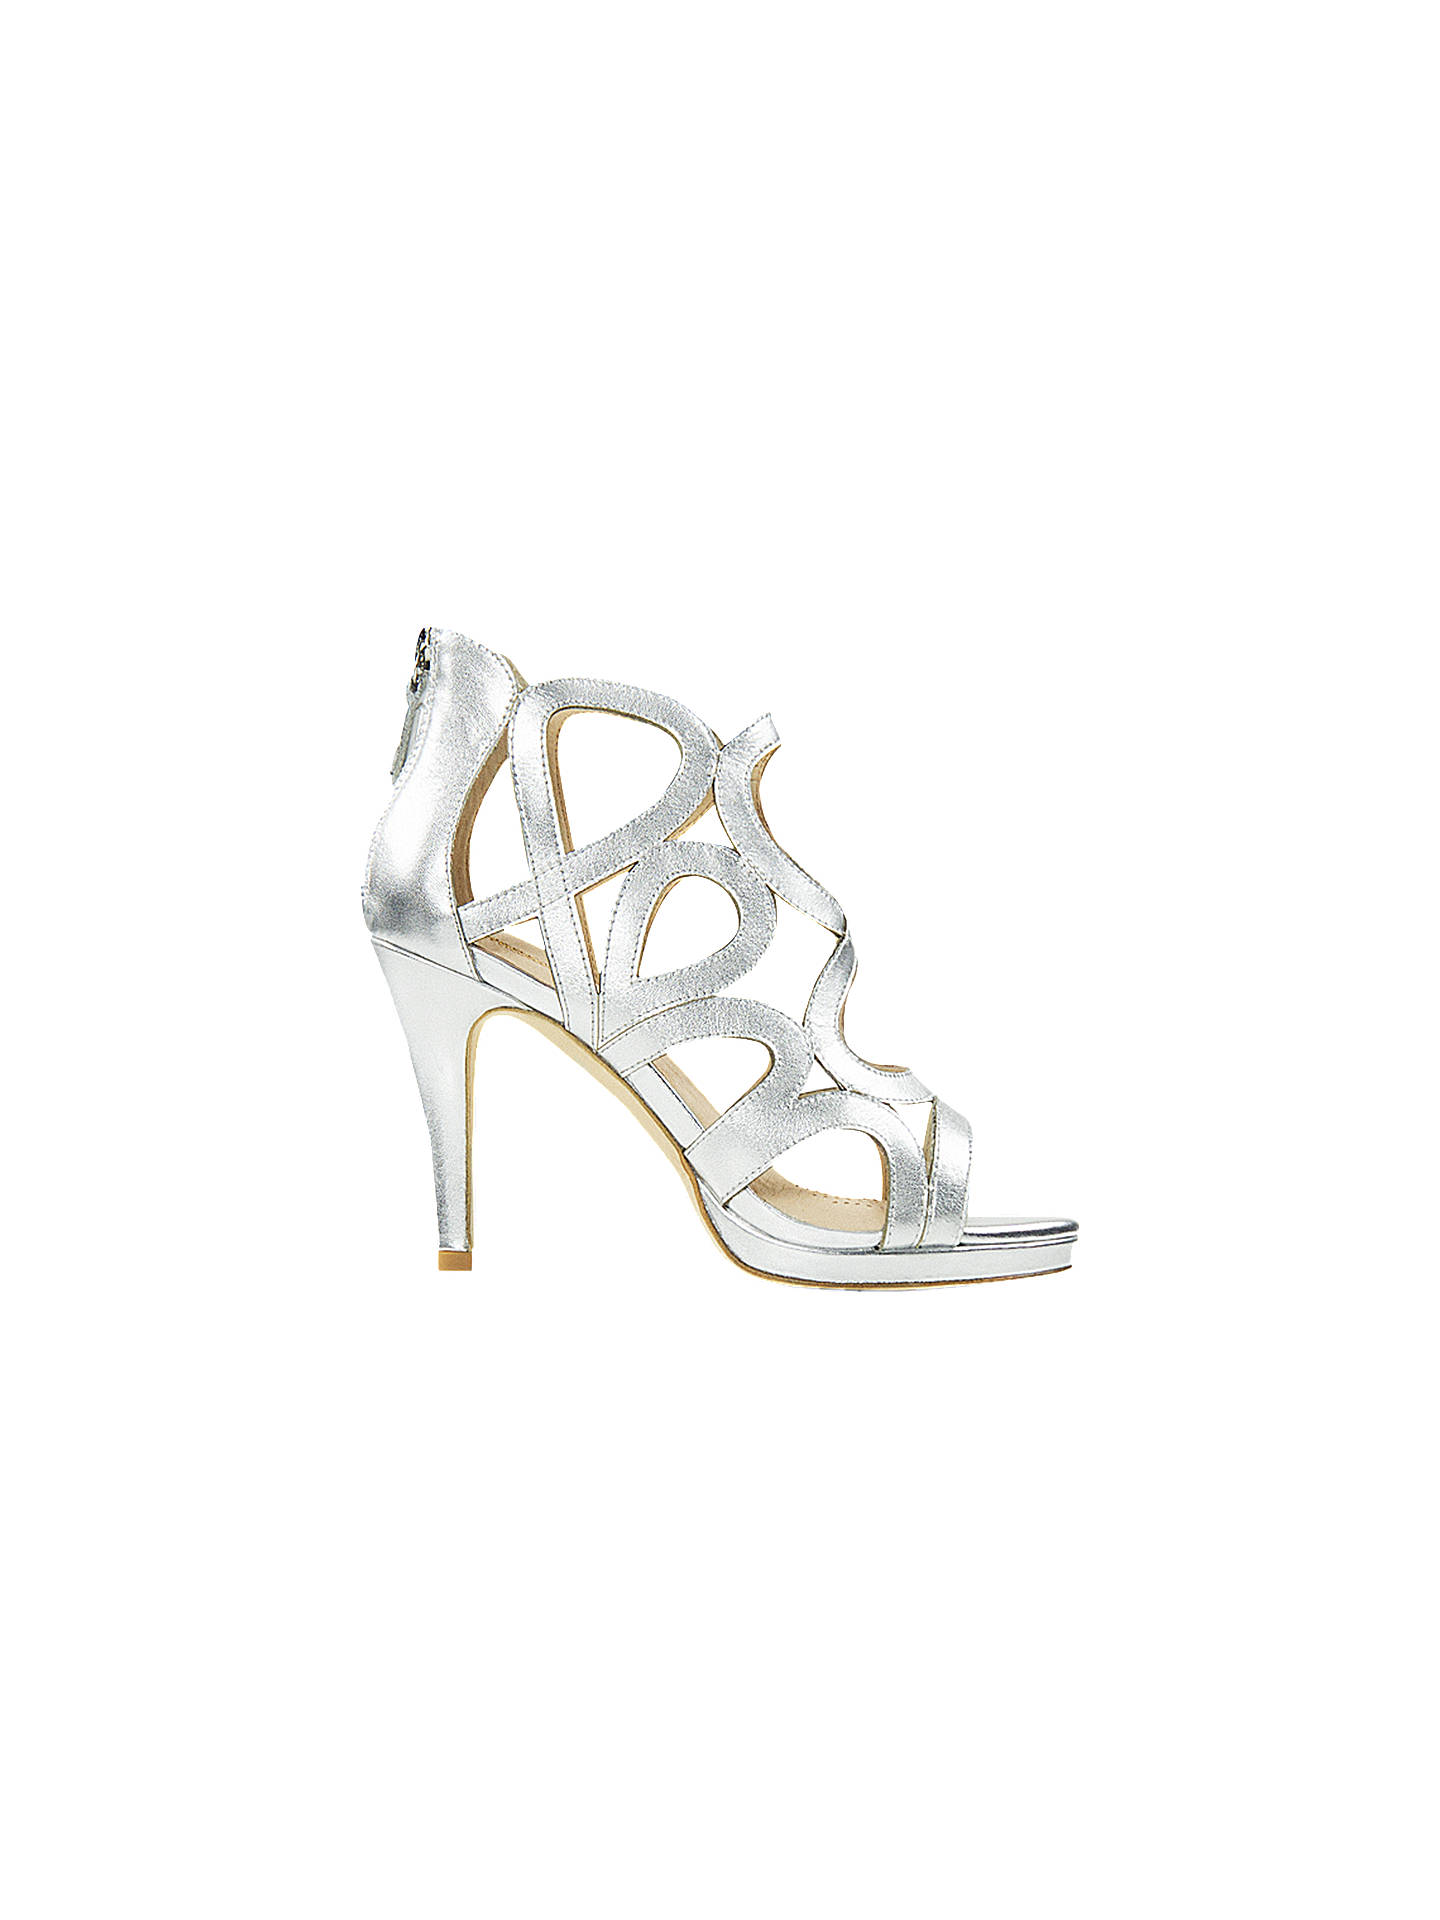 9874ce023aff Buy Sargossa Redefined Stiletto Heel Sandals, Silver Leather, 8 Online at  johnlewis.com ...